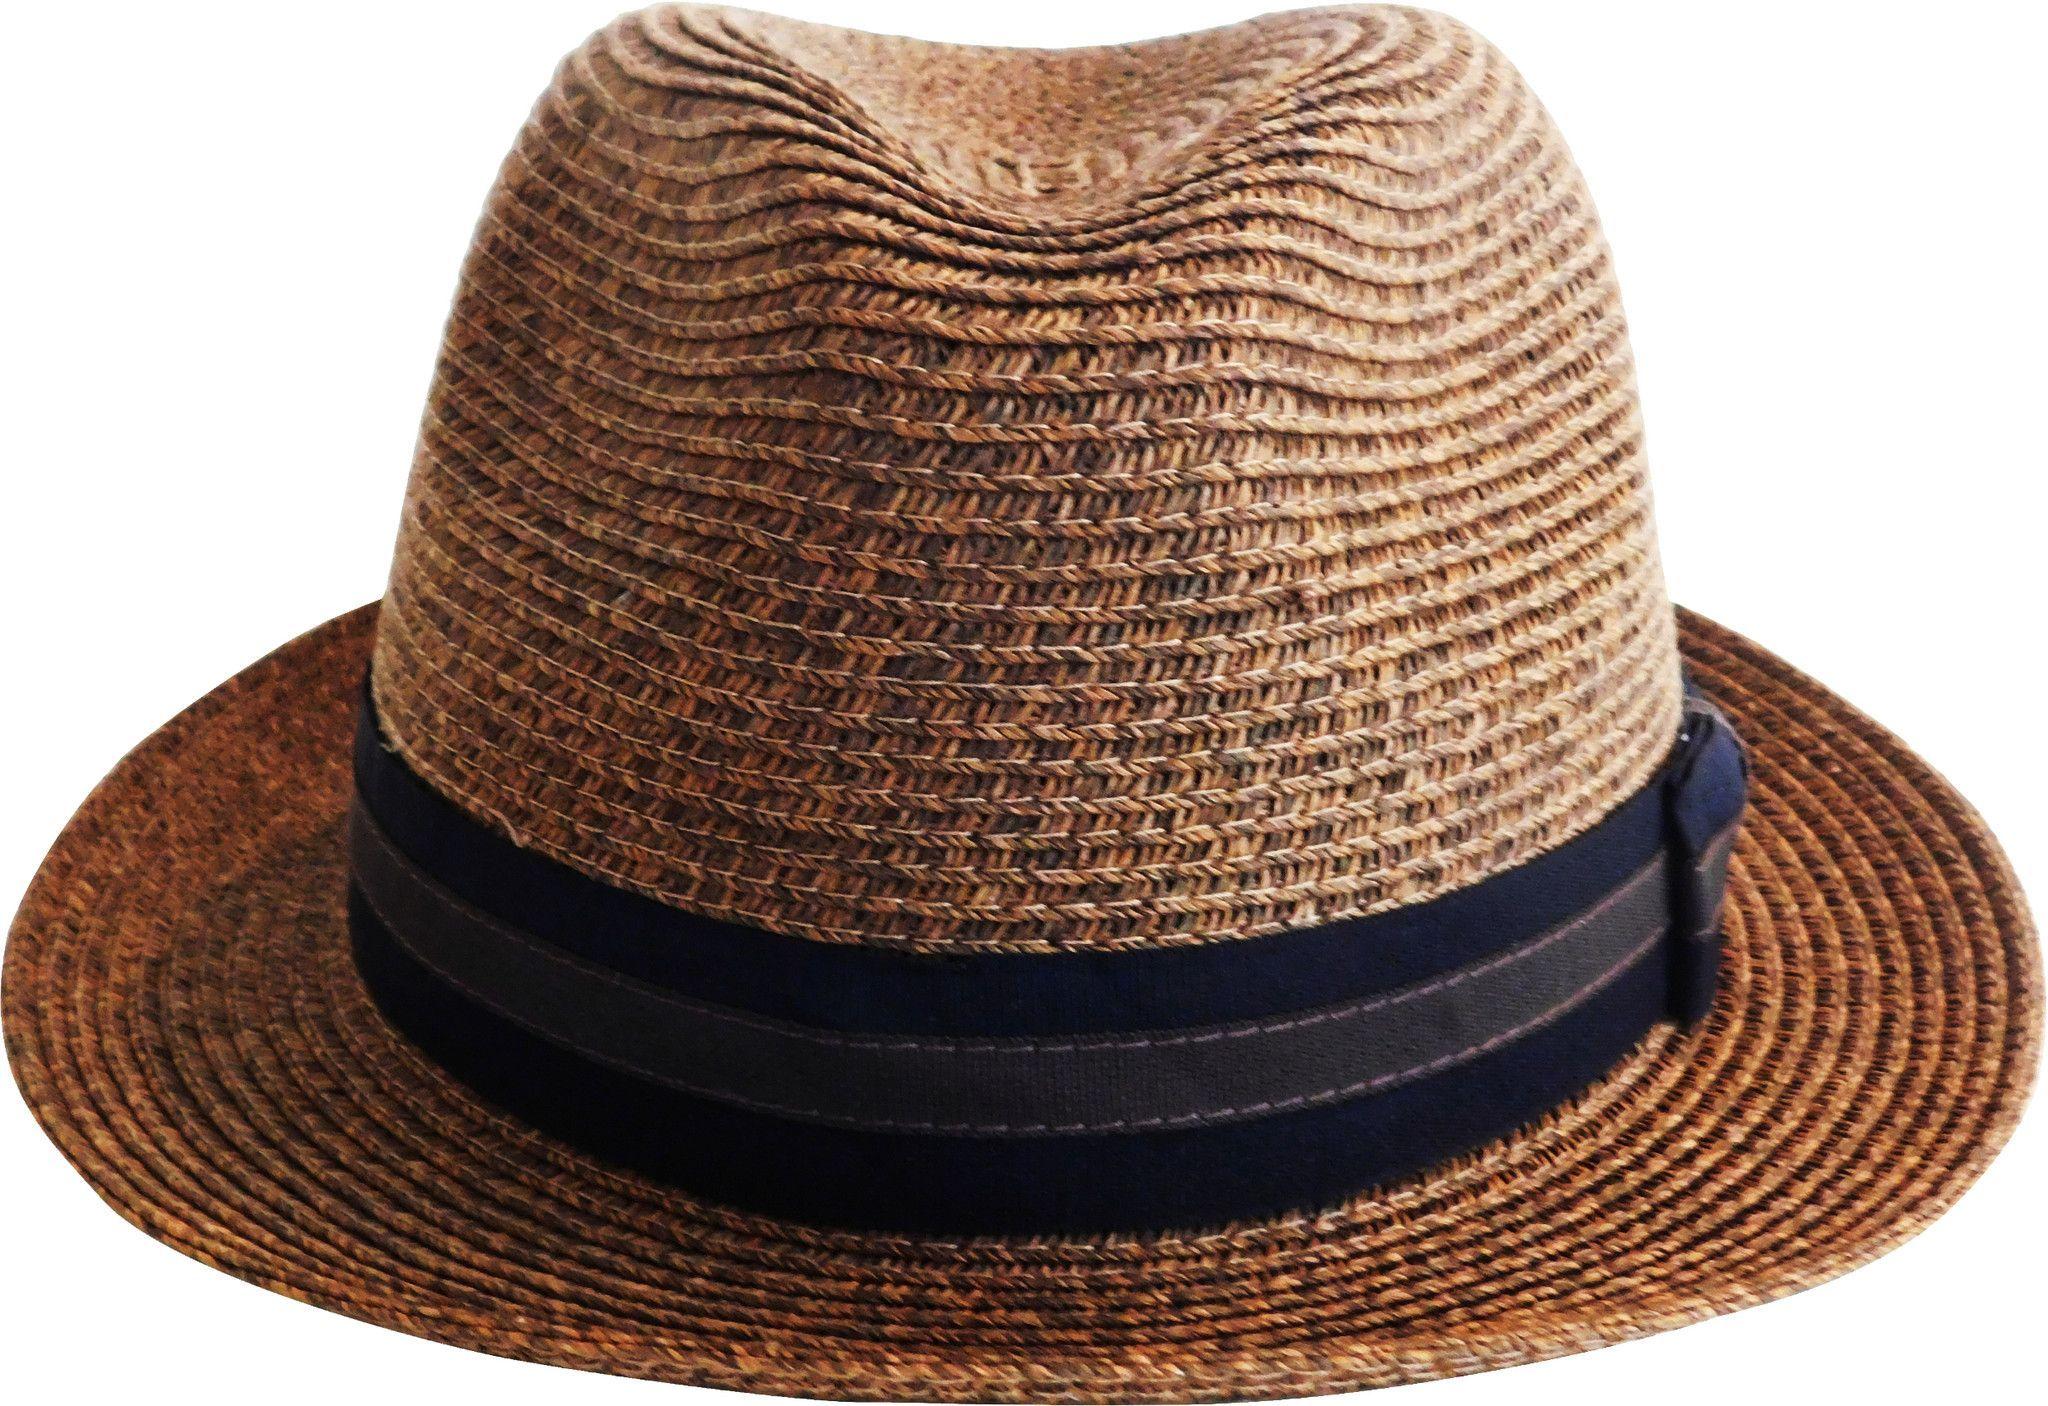 756ac8a594d Brooklyn Hat Co Bedford Straw Fedrora Sewn Braid Paper Poly Bend - Two Tone  Grosgrain Band 1 3 4